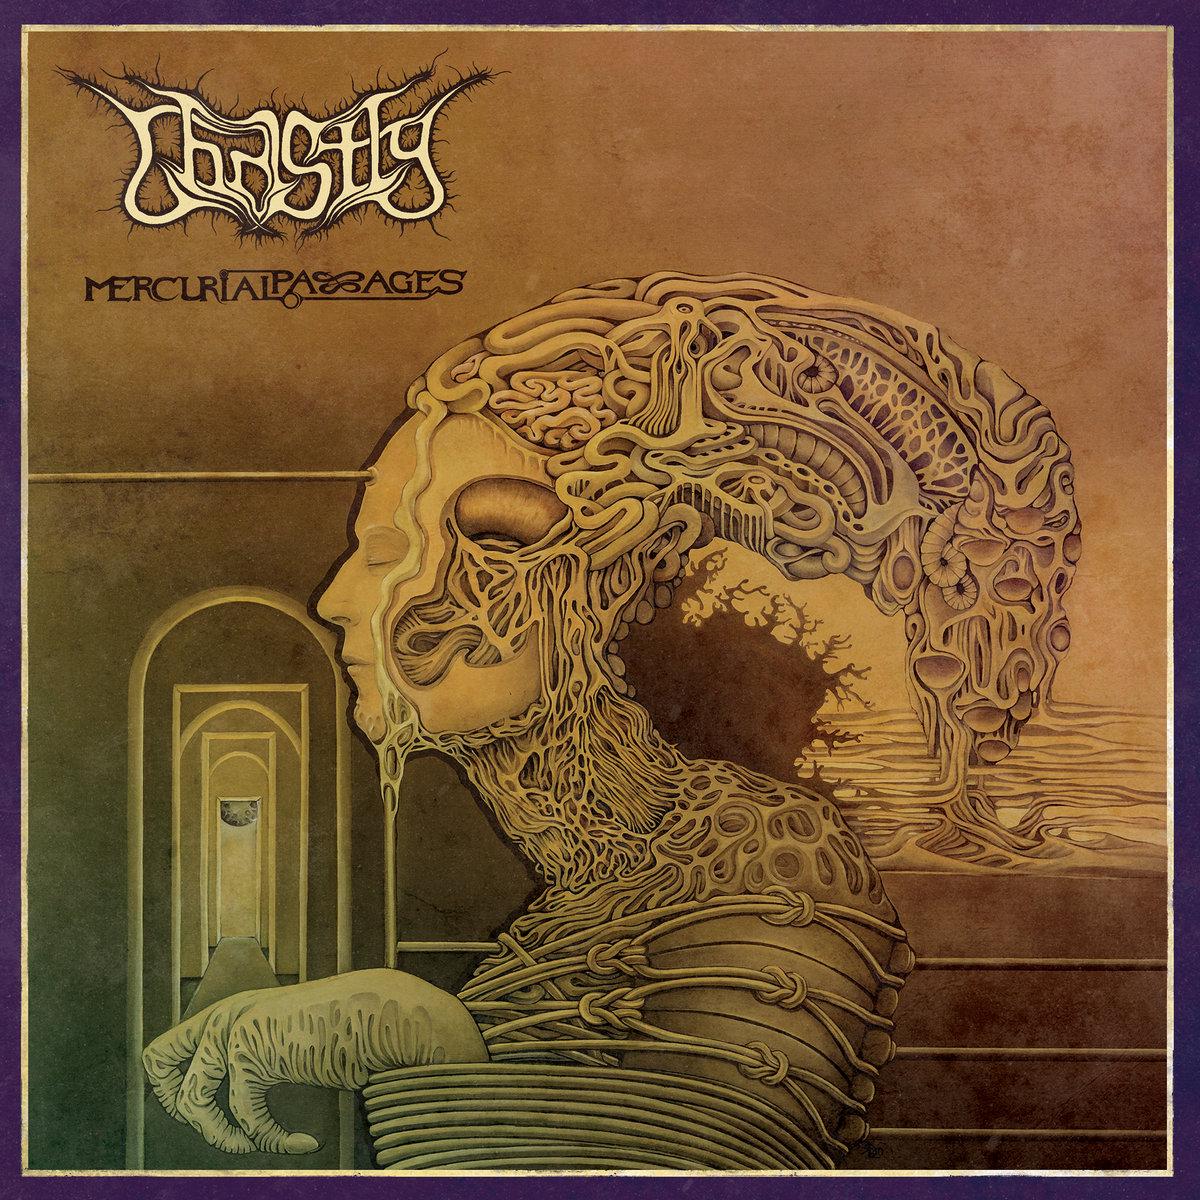 Ghastly Mercurial Passages Album Cover Artwork